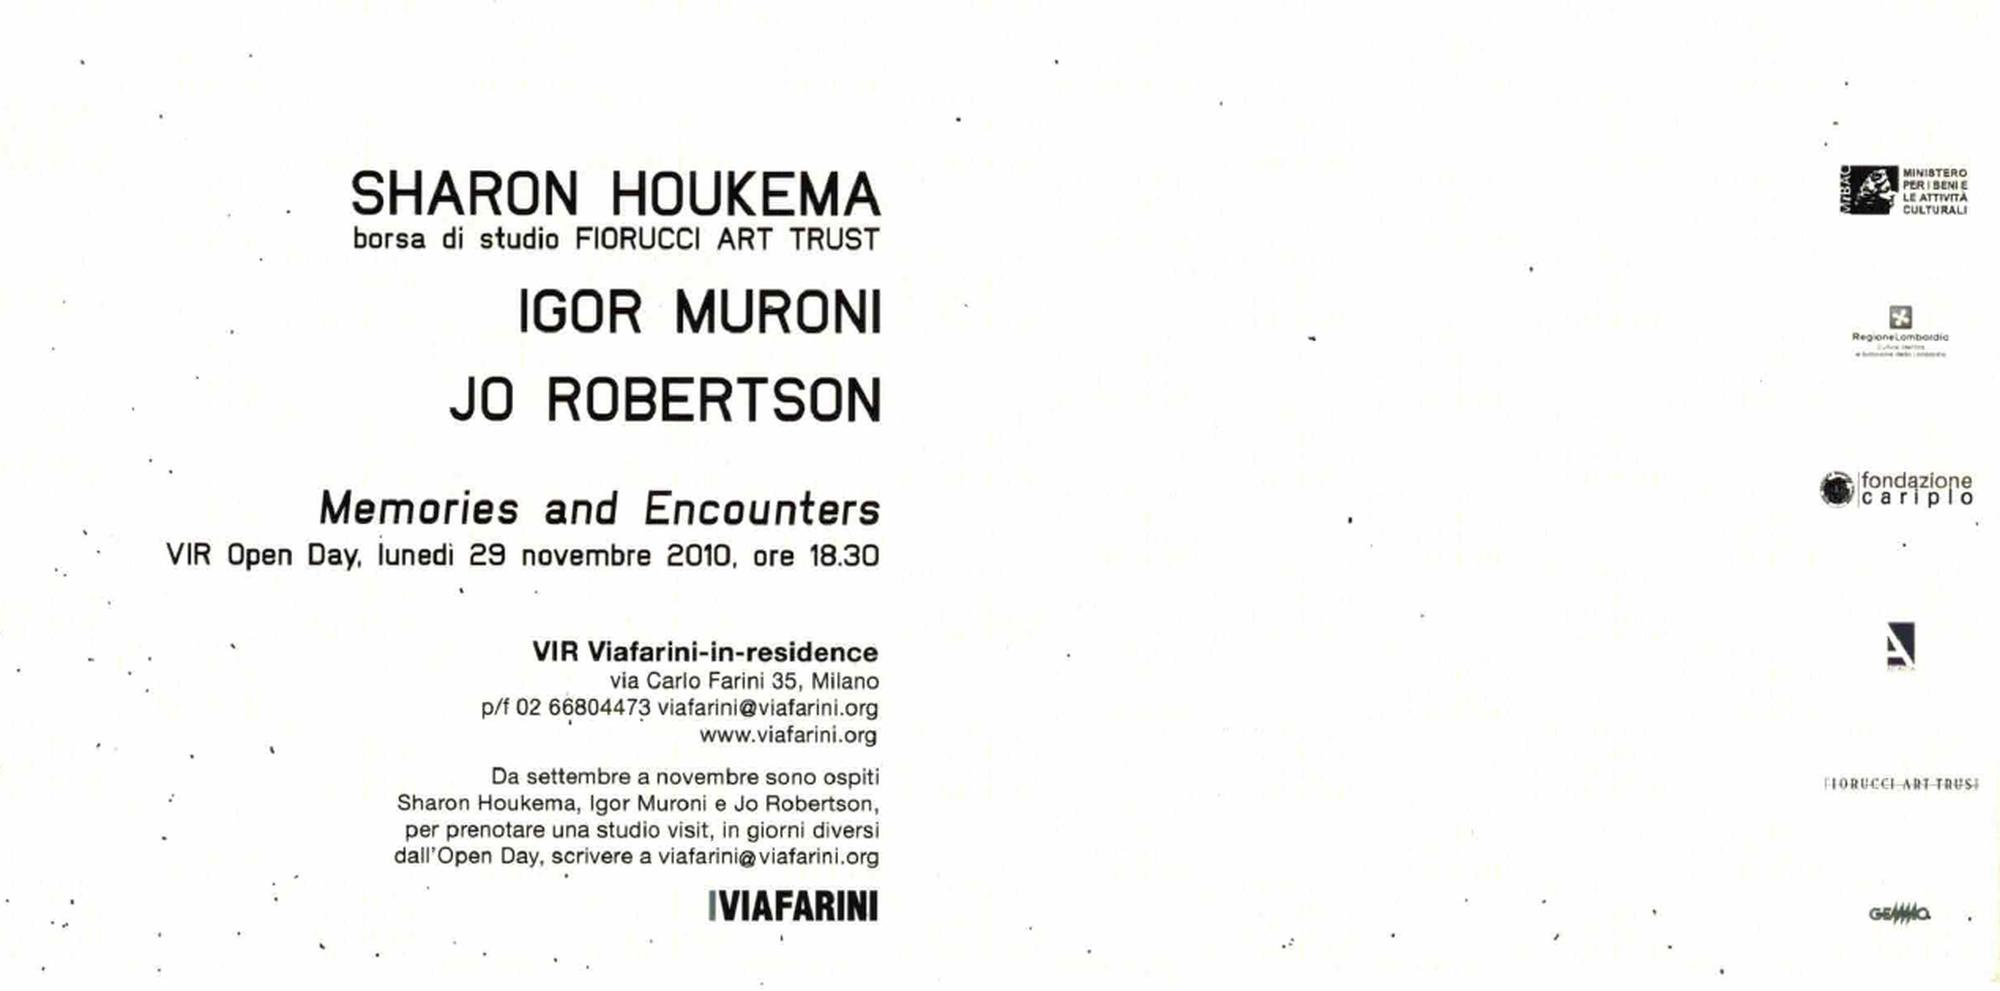 Memories and Encounters. Sharon Houkema, Igor Muroni, Joanne Robertson